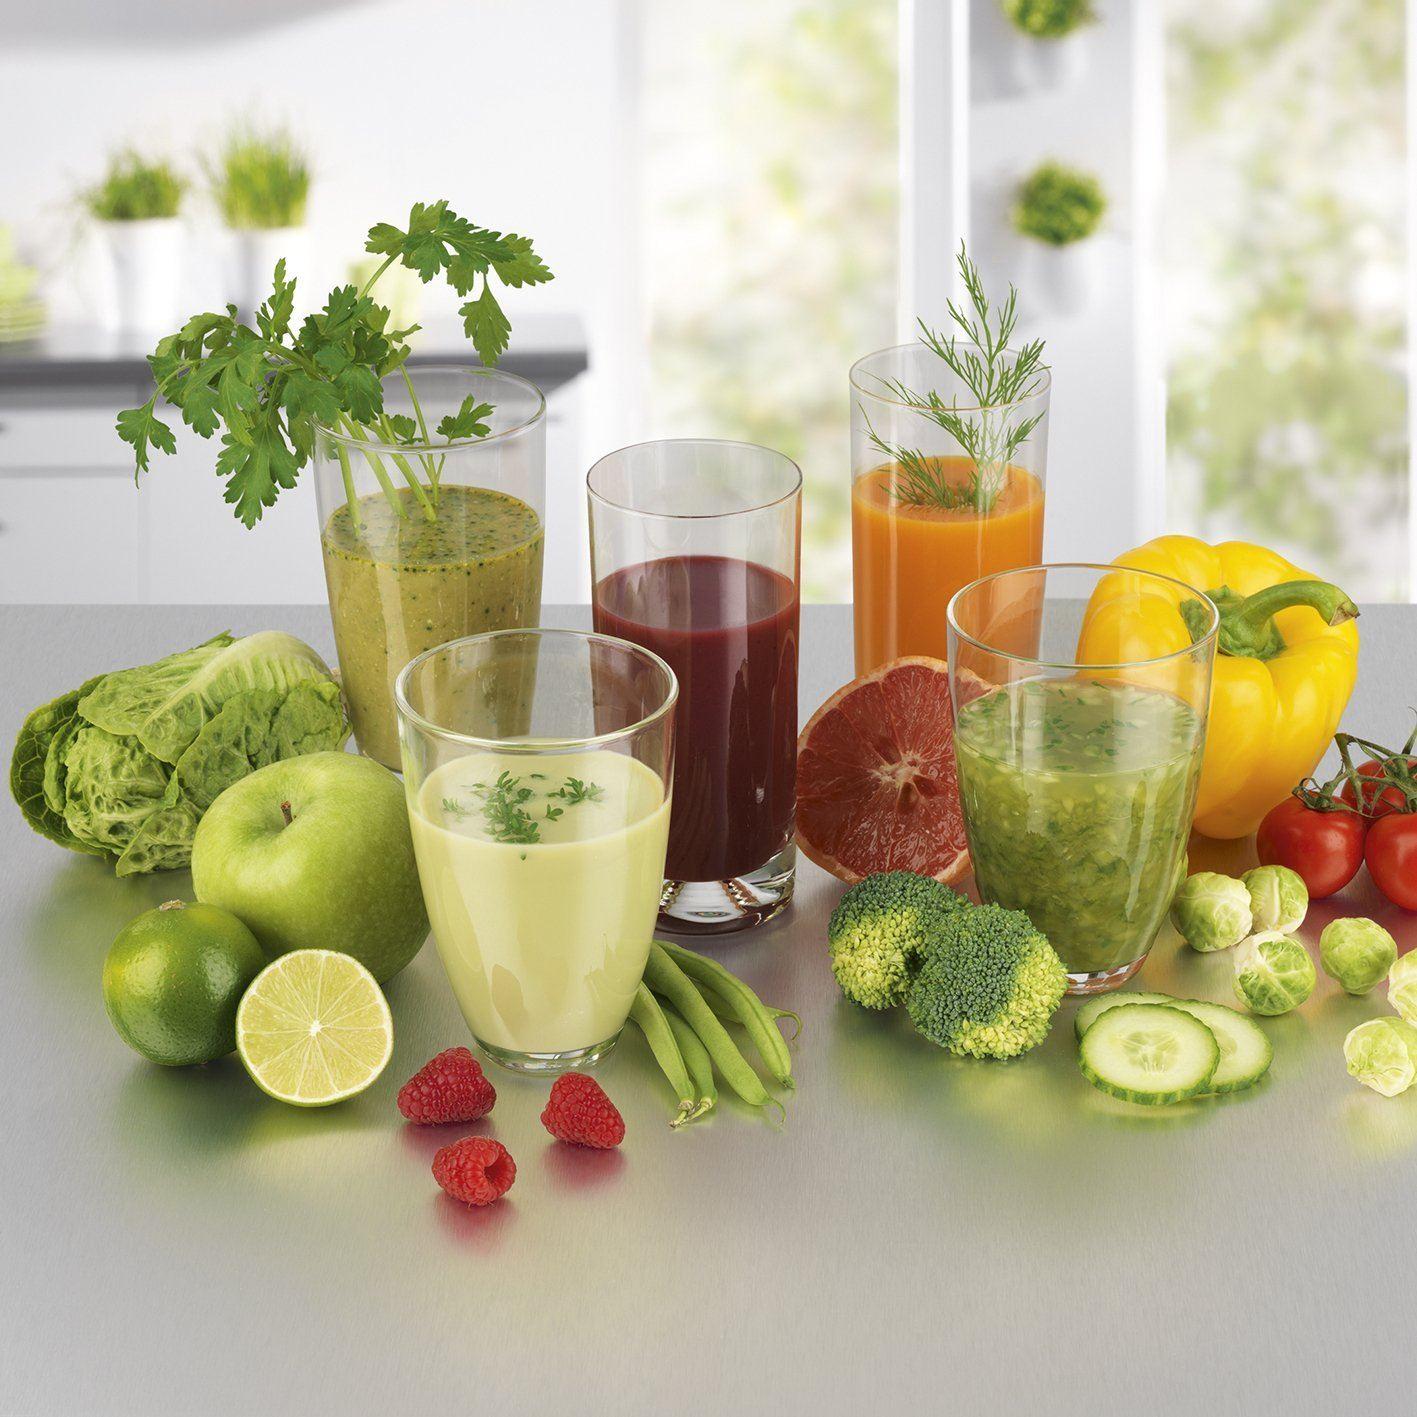 GOURMETmaxx 09817 Nutrition Mixer Für Smoothies